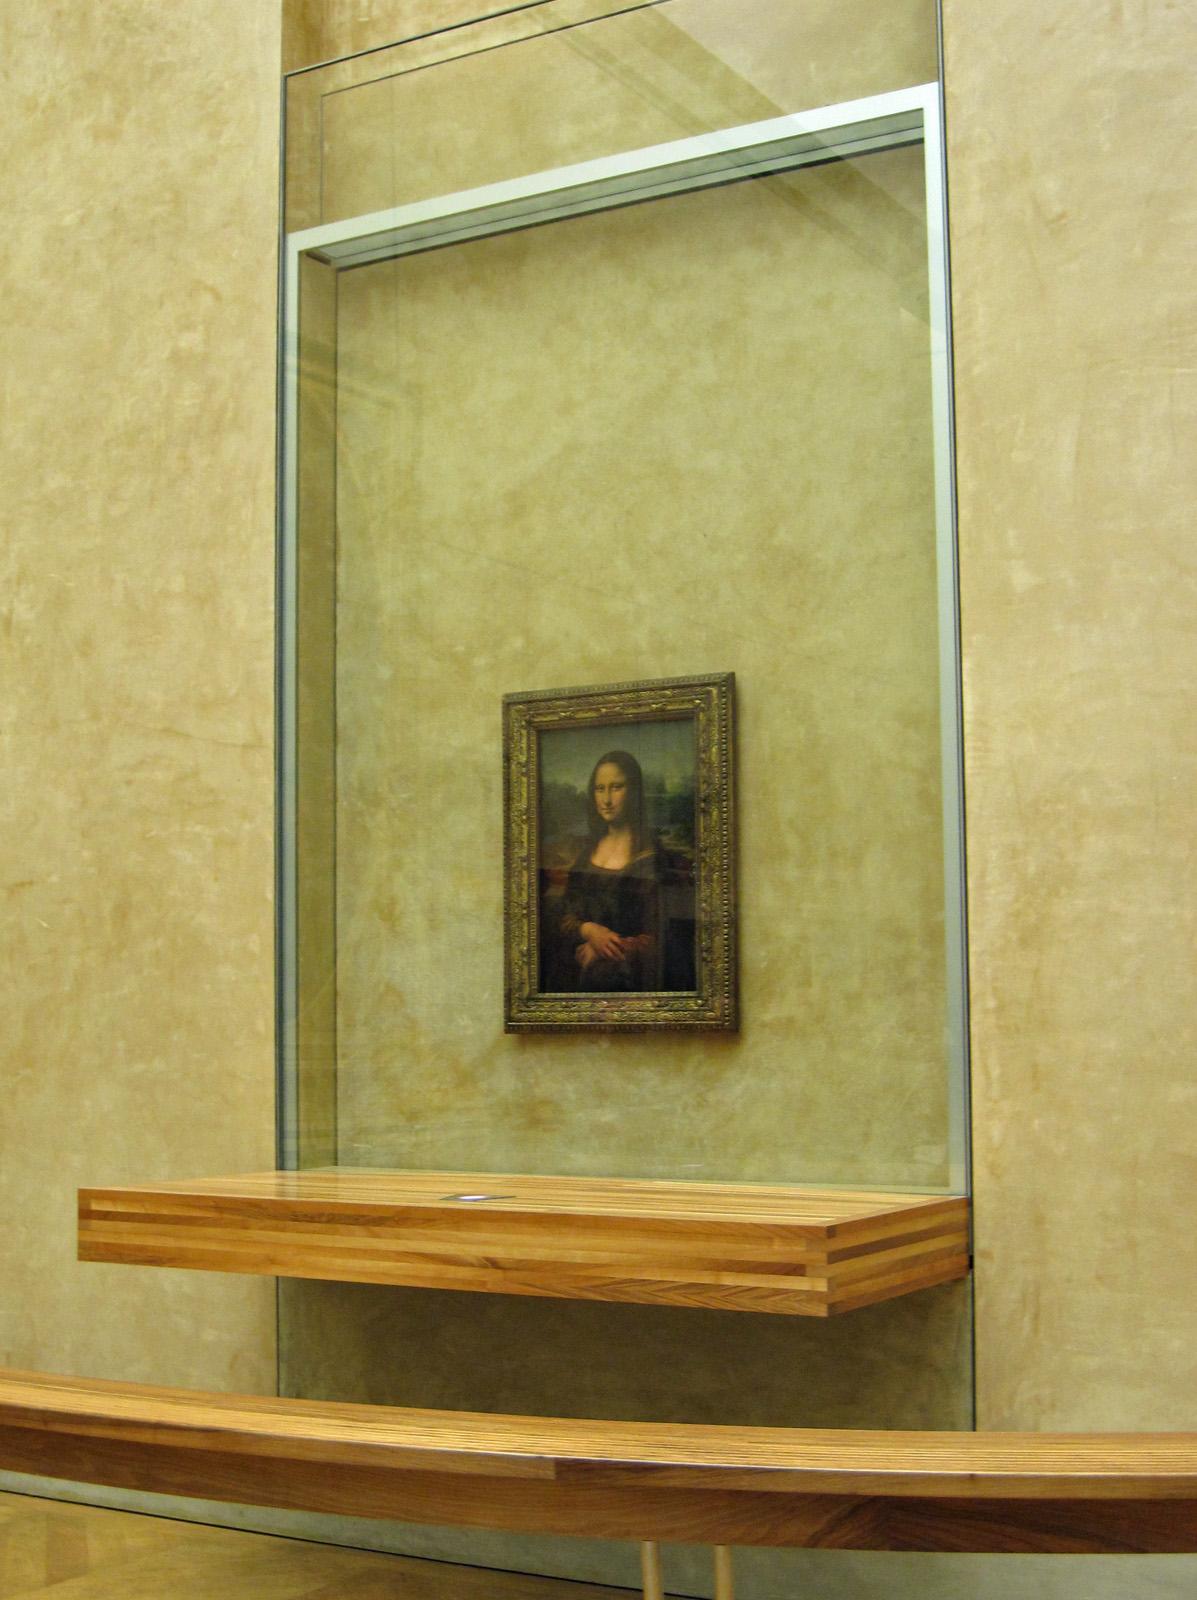 Mona da vinci from germany 9